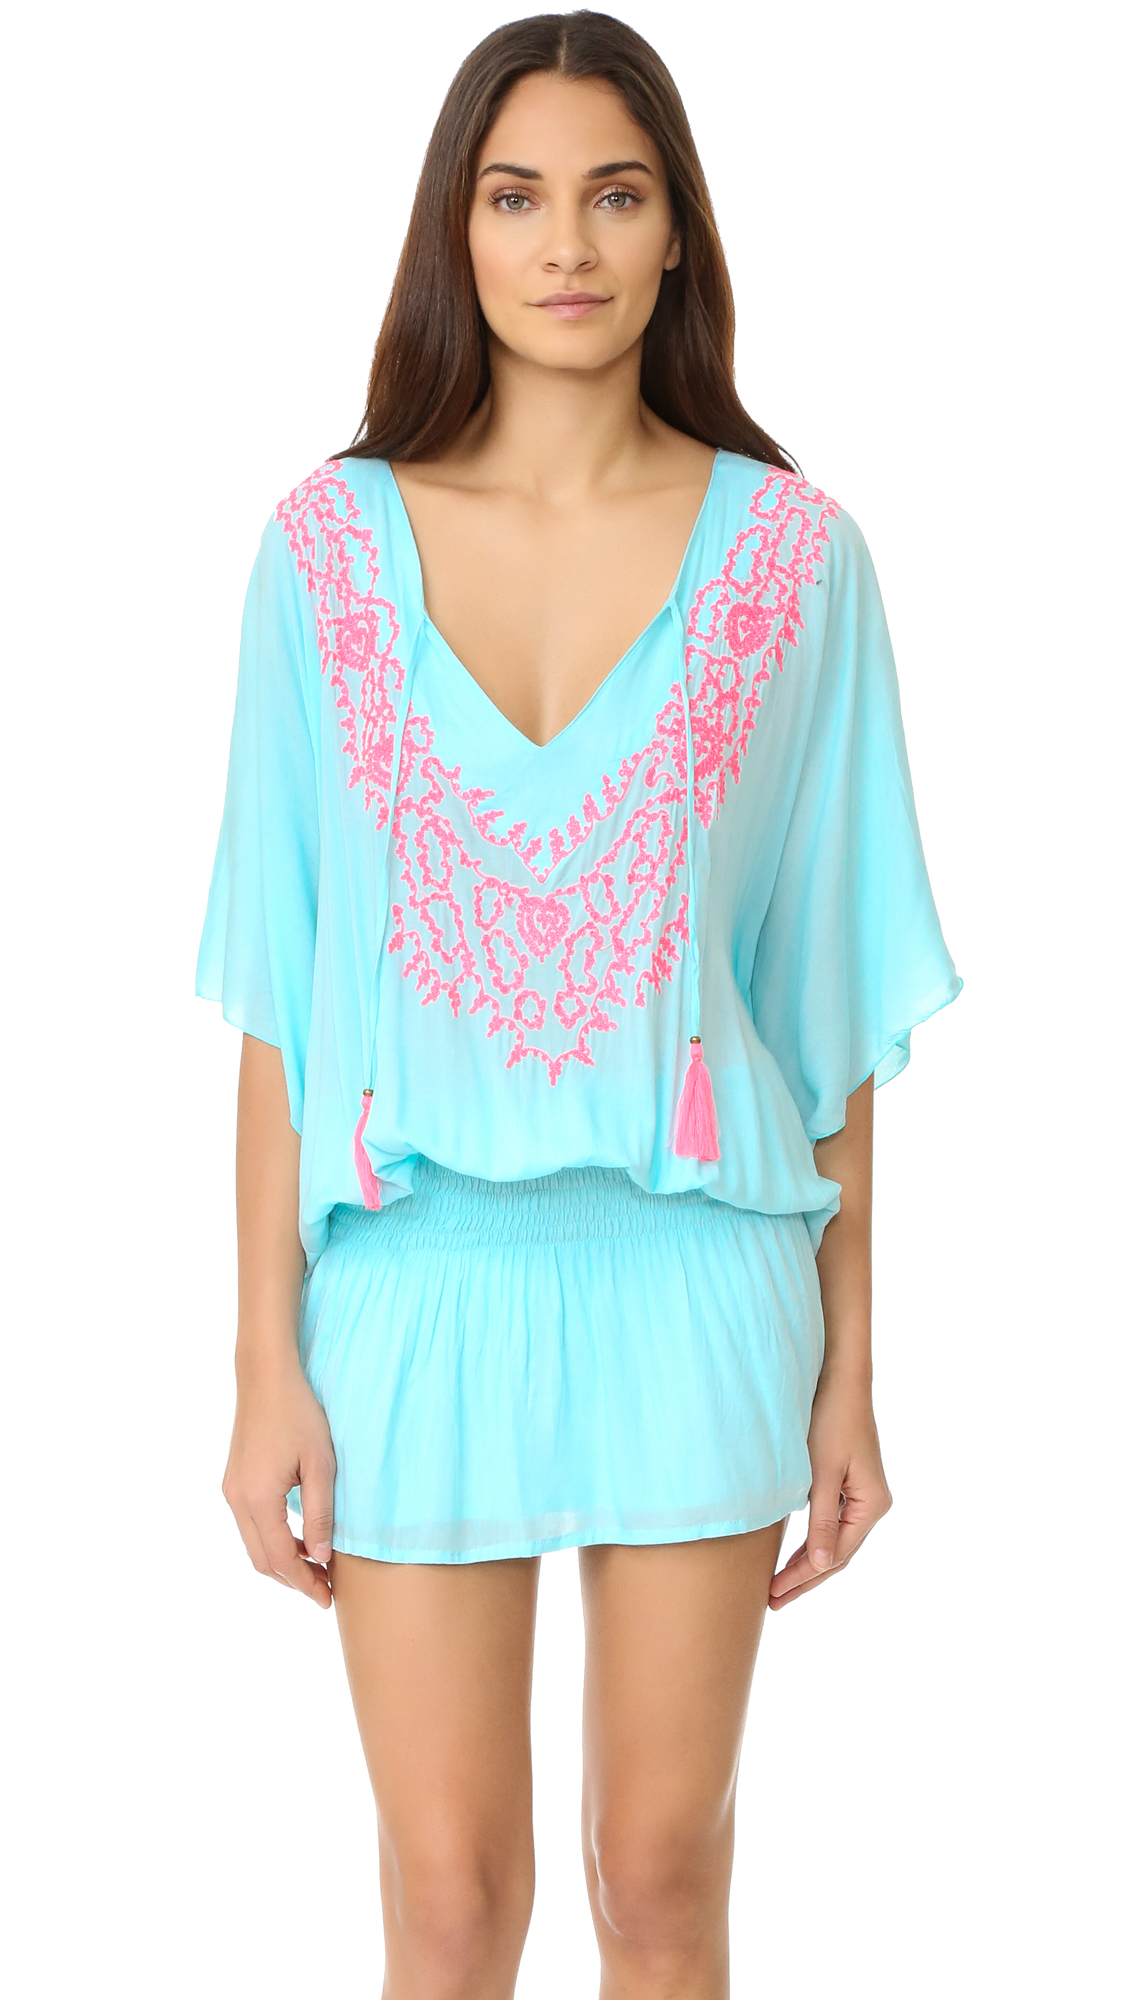 TIARE HAWAII Margarita Dress - Aqua/Pink